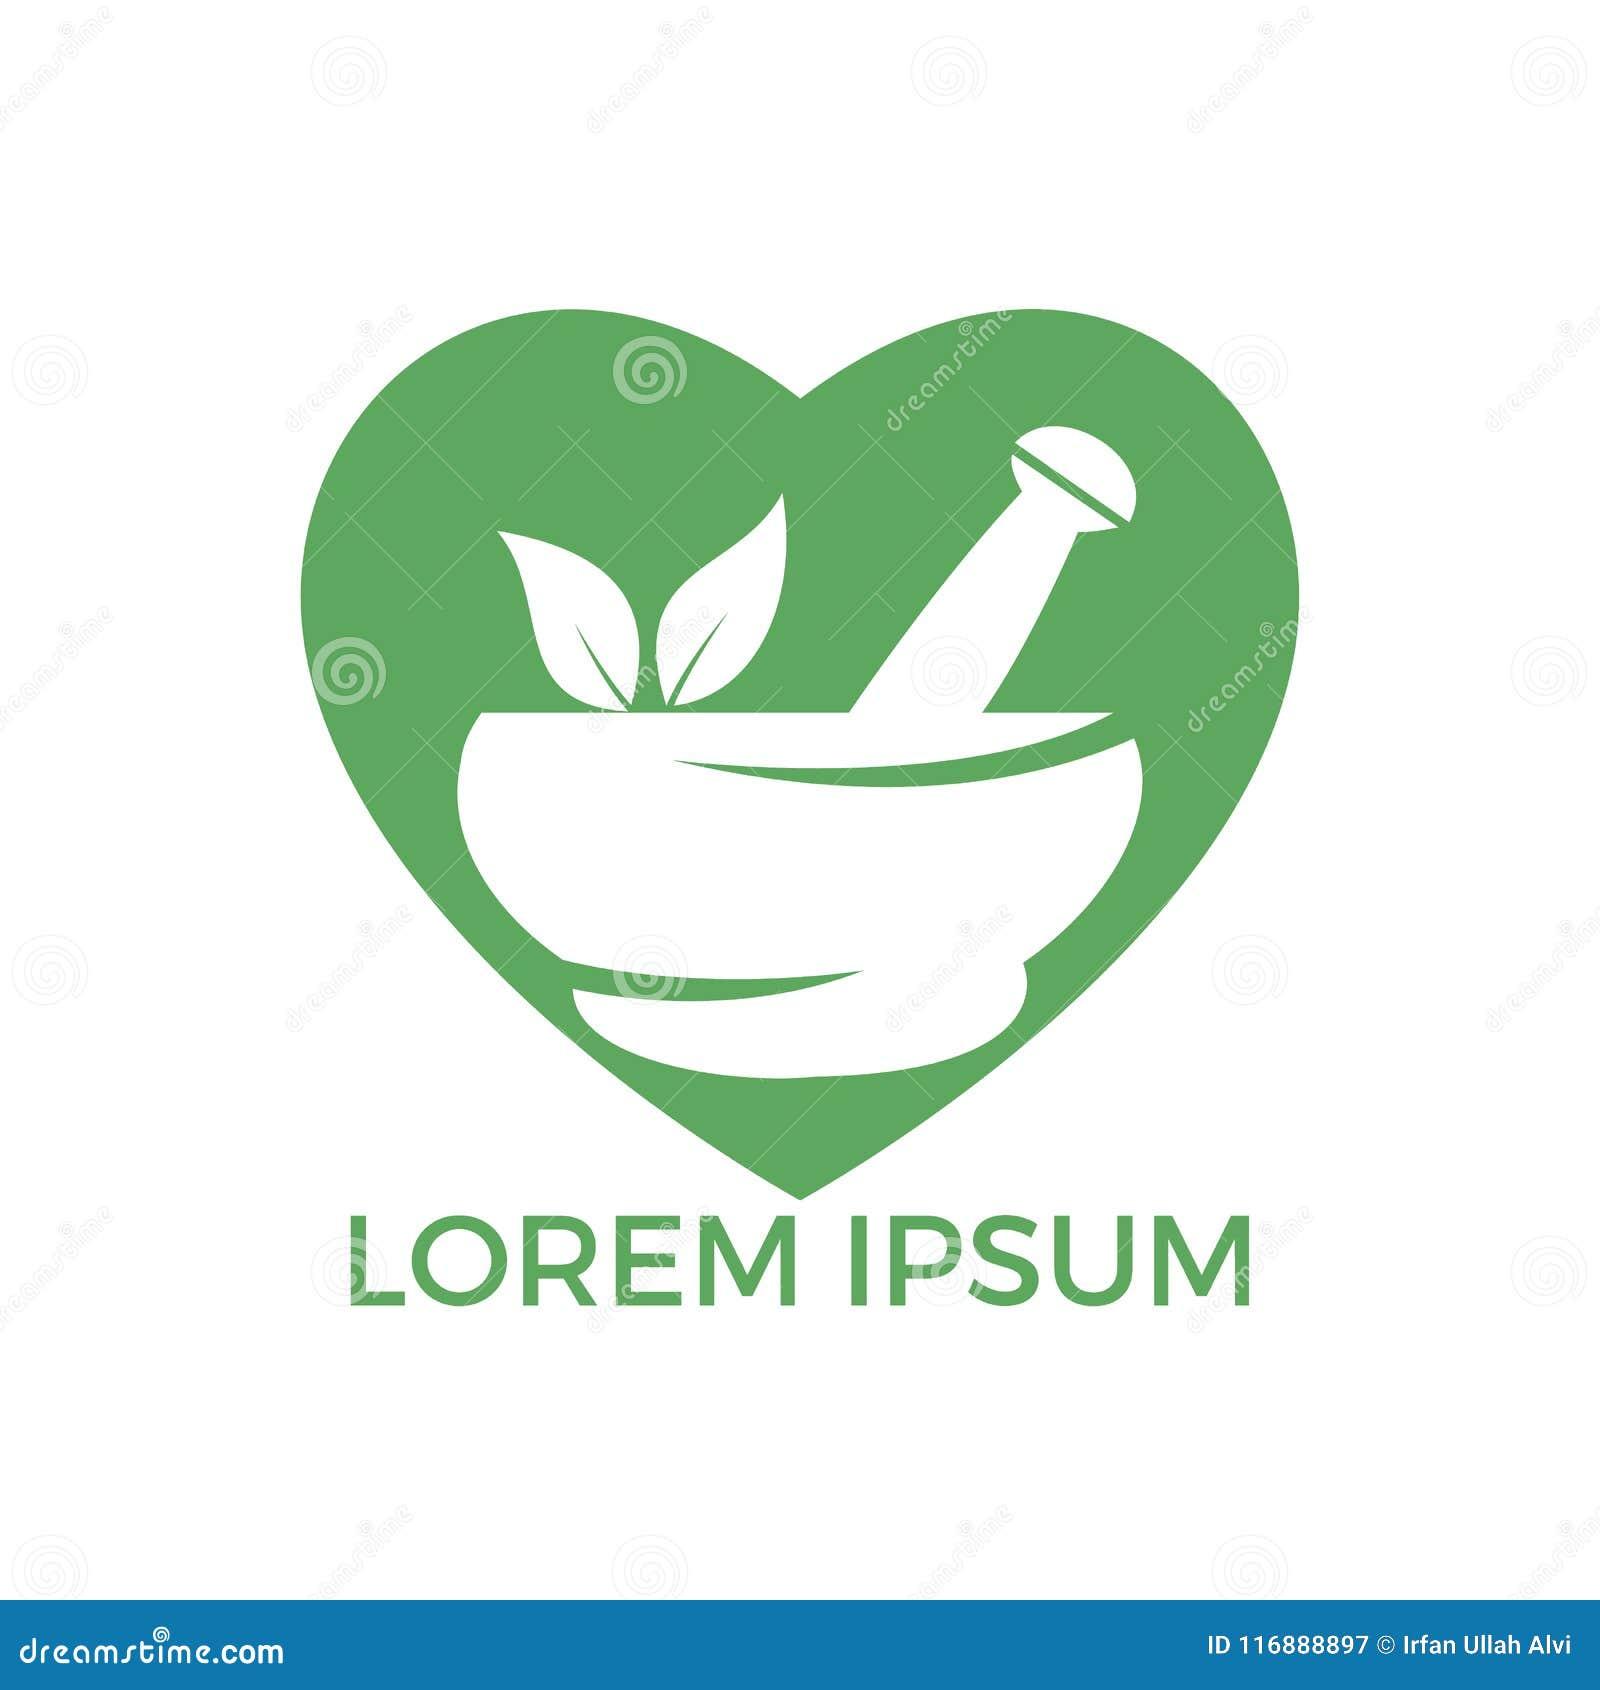 Medizinisches Logodesign der Herzformapotheke